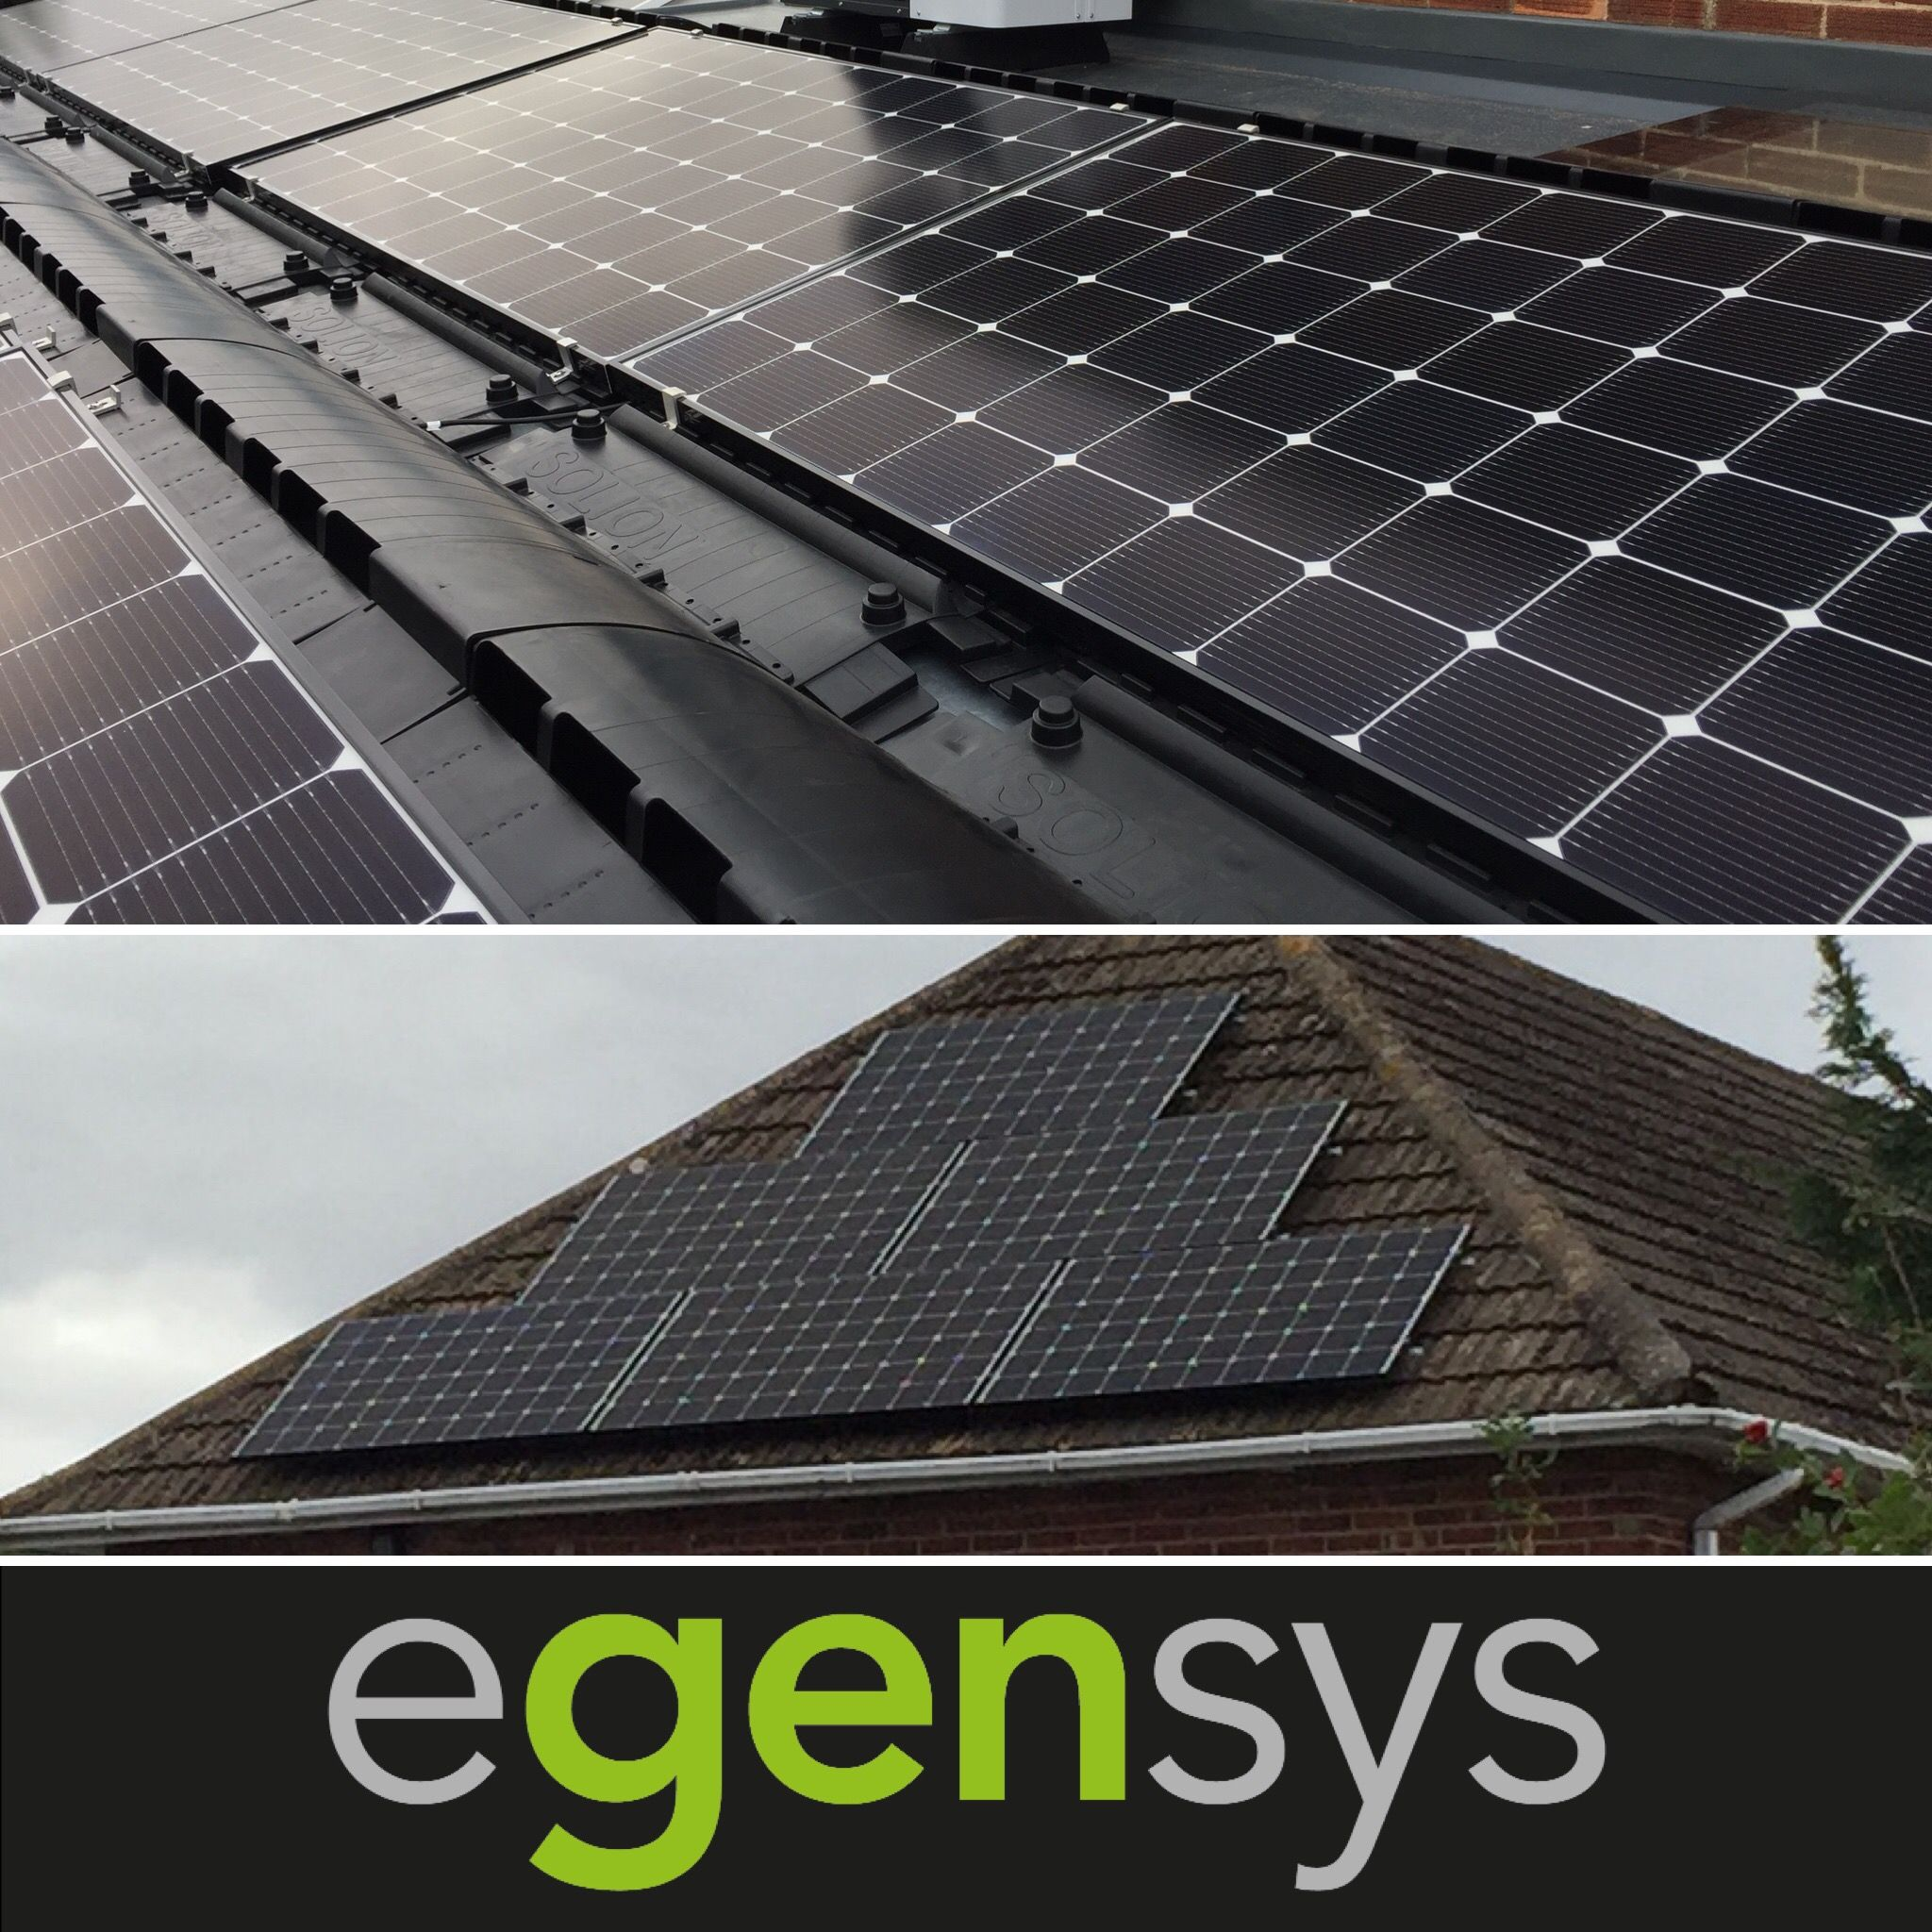 4 7kw Solar Photovoltaic Installation Using 14 High Efficiency 335 Watt Lg Neon Lg335n1c A5 Solar Panels With A Solis Inverter Solar Solar Pv Roof Solar Panel